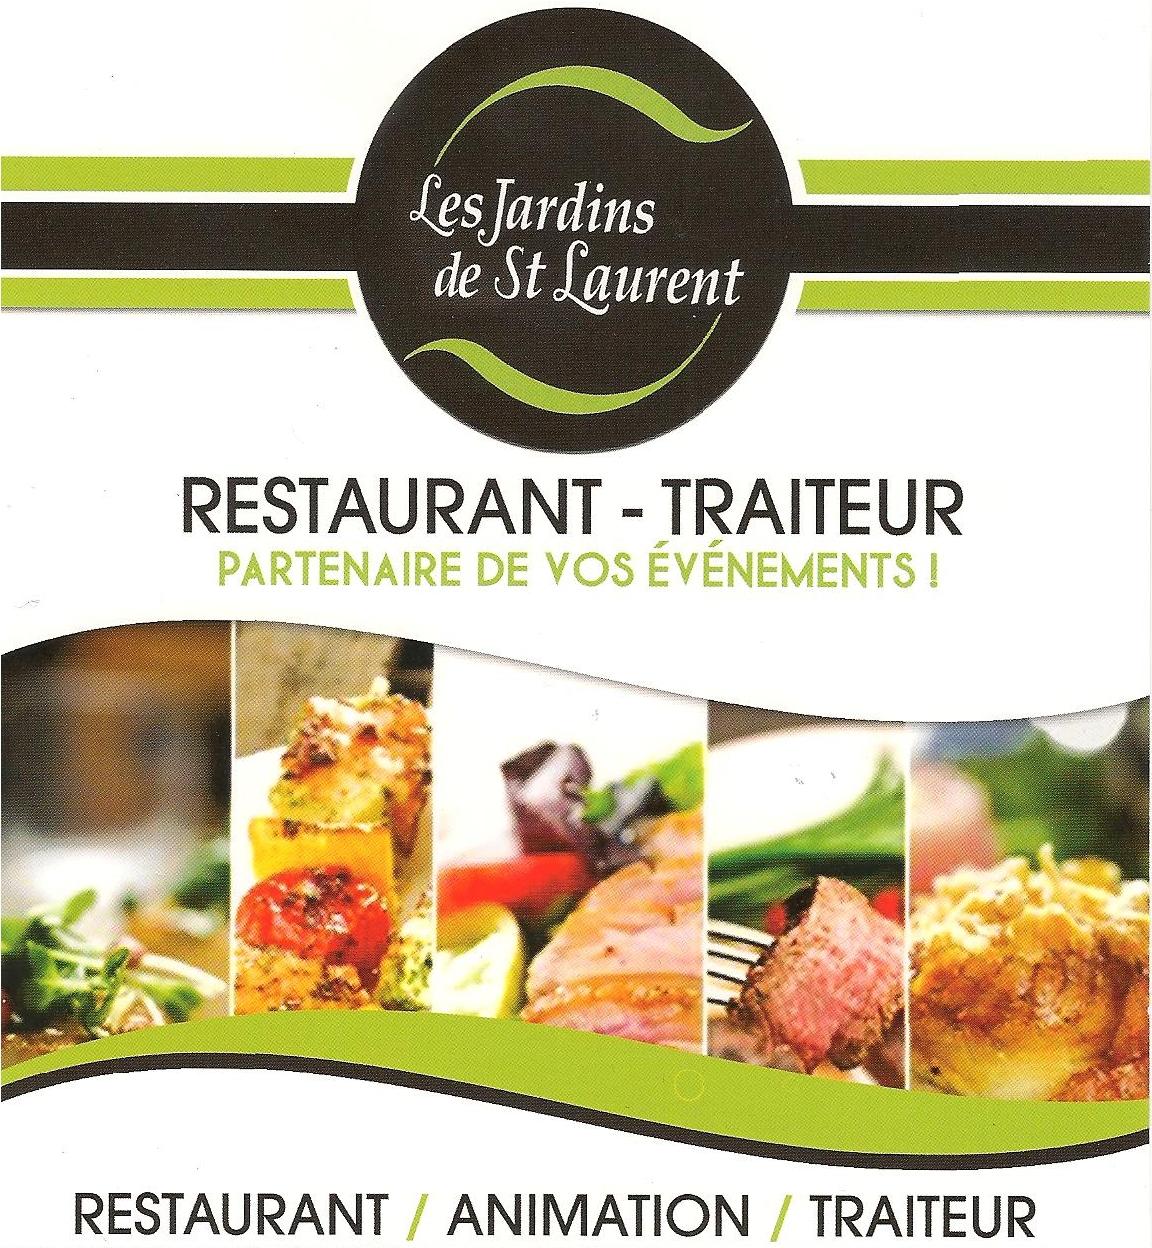 https://tti.asso.fr/wp-content/uploads/2017/04/jardin_slb1-1.jpg